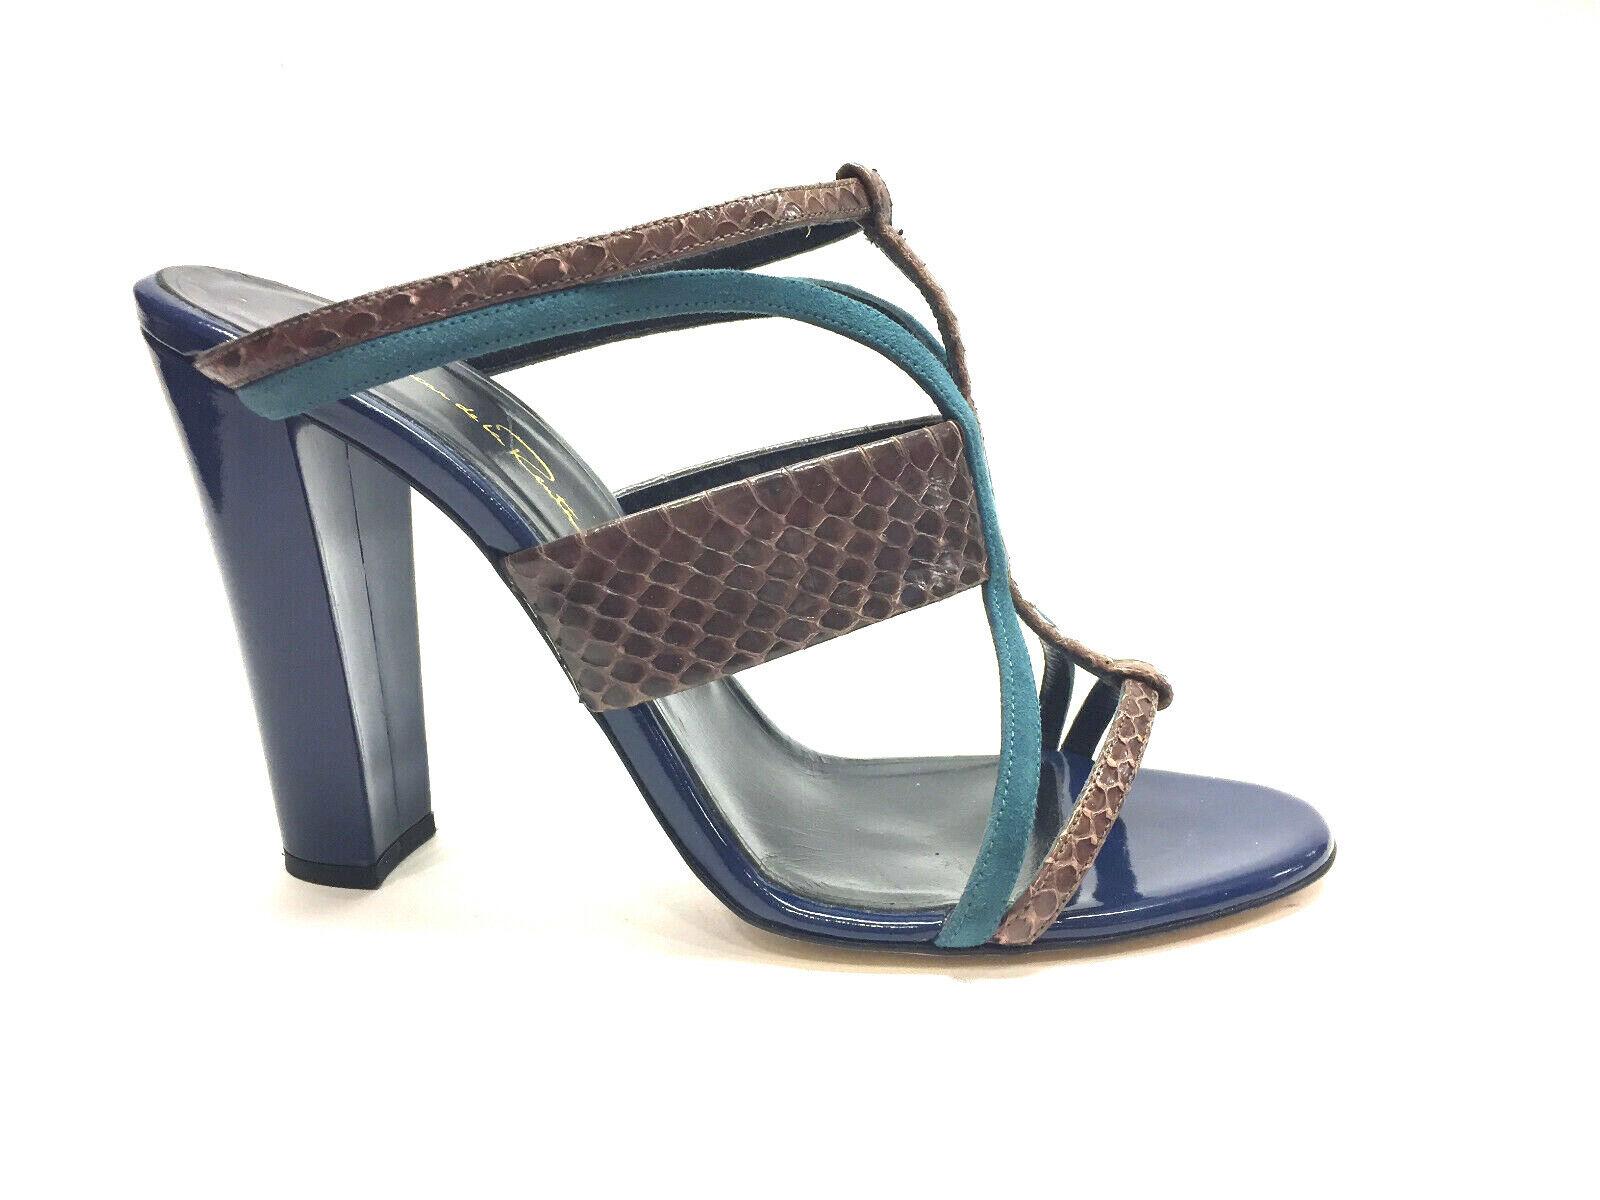 vendita di offerte OSCAR de la RENTA Marrone Python Royal-blu Patent Leather Leather Leather Heel Sandals Sz40  economico e di alta qualità